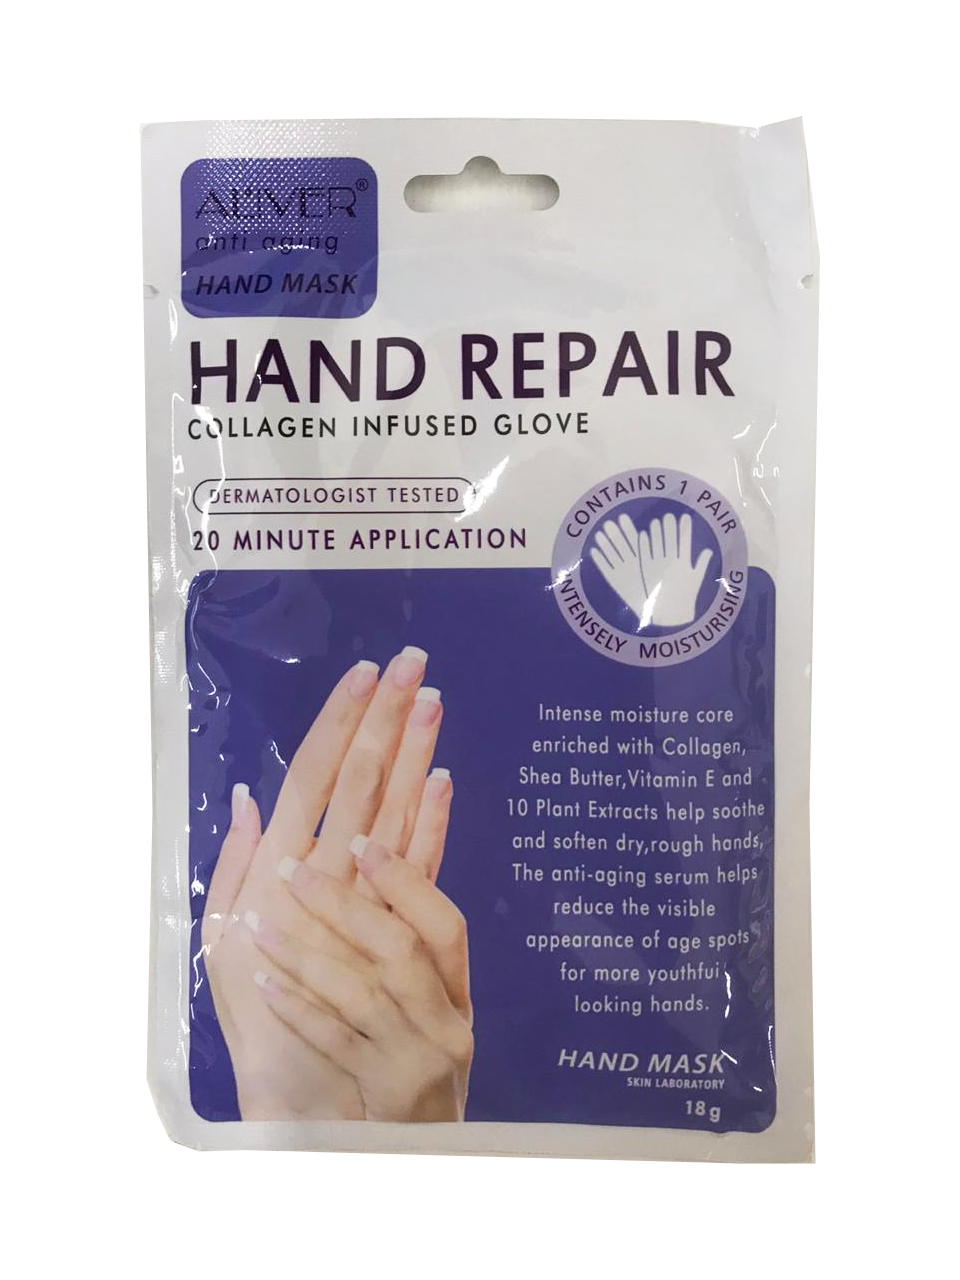 Hand Repair Collagen Infused Glove 18g